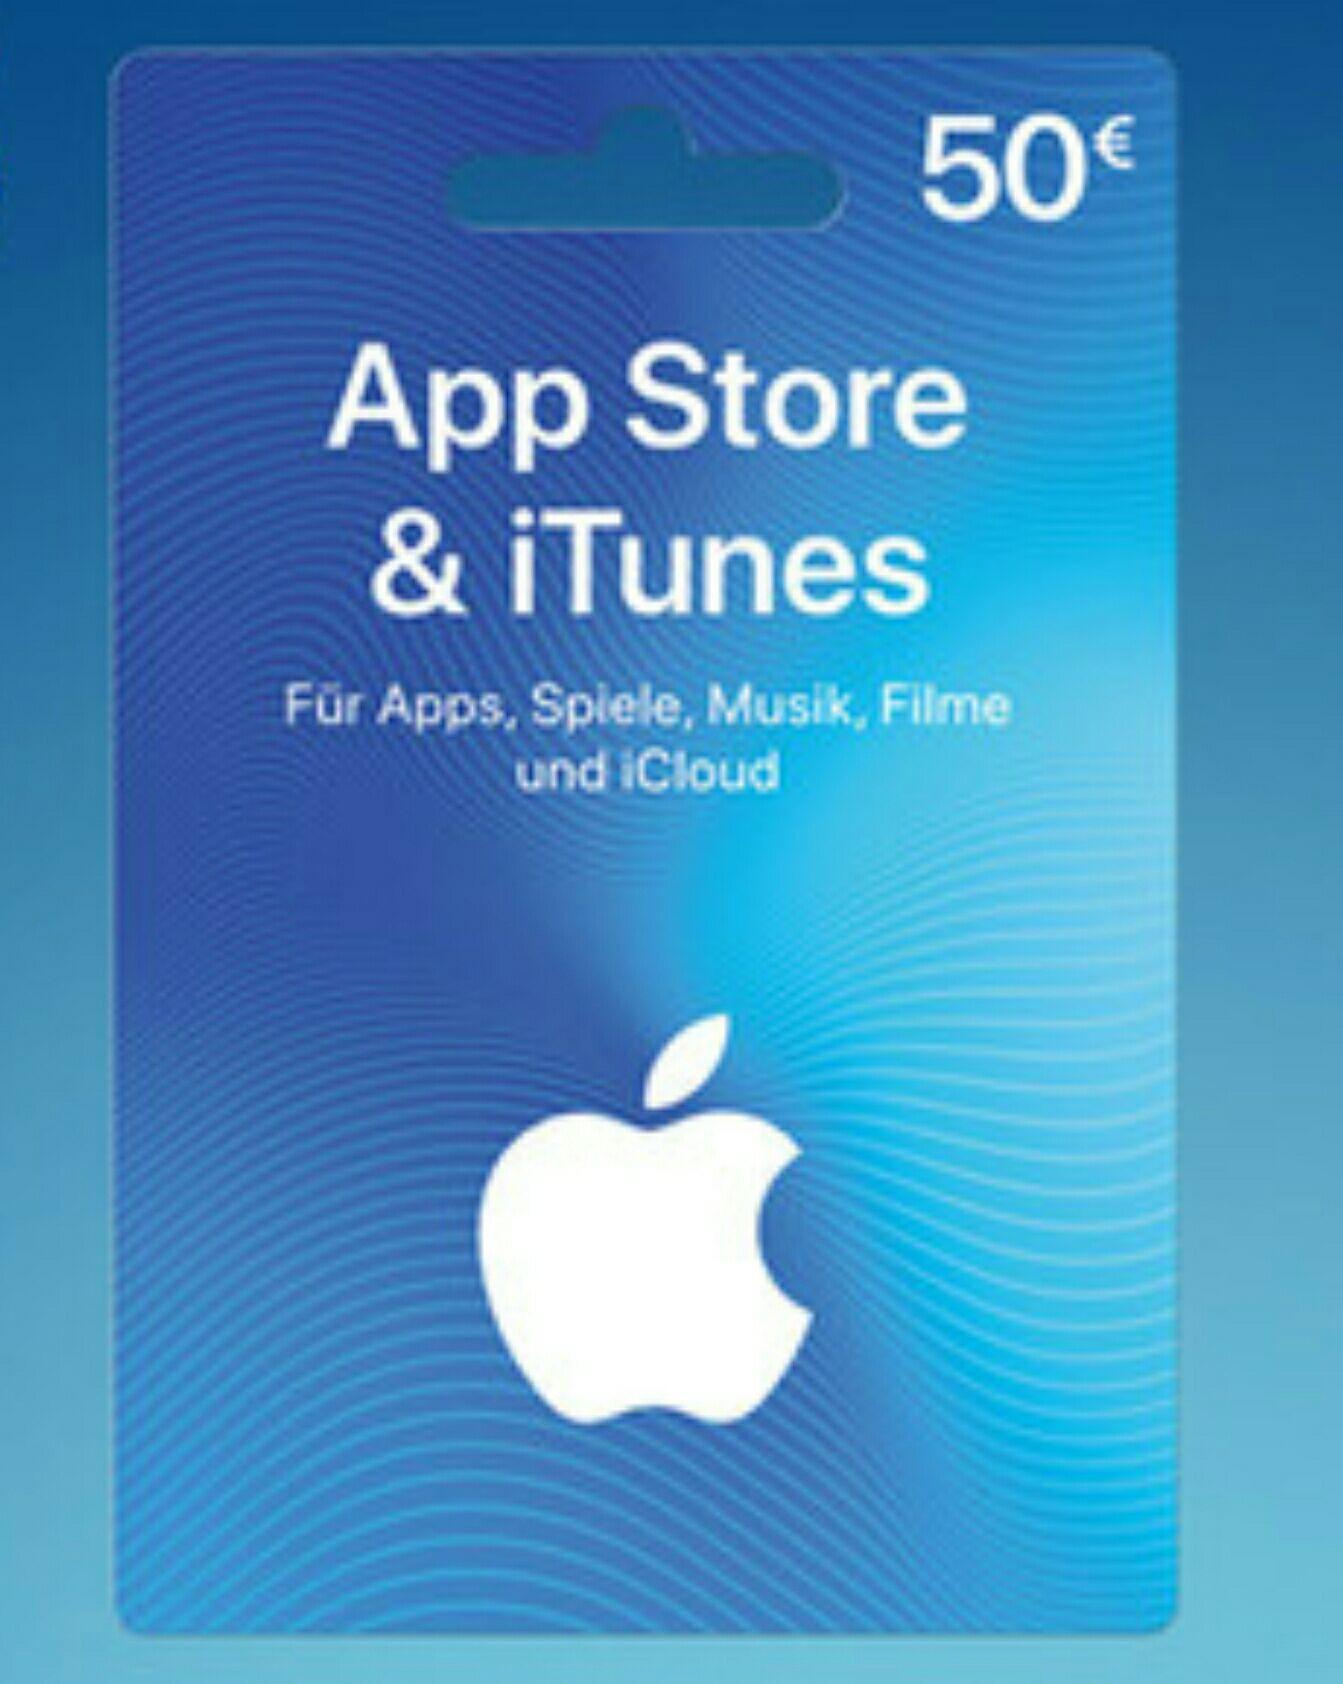 [HOFER] -15% auf App Store & iTunes Geschenkkarte